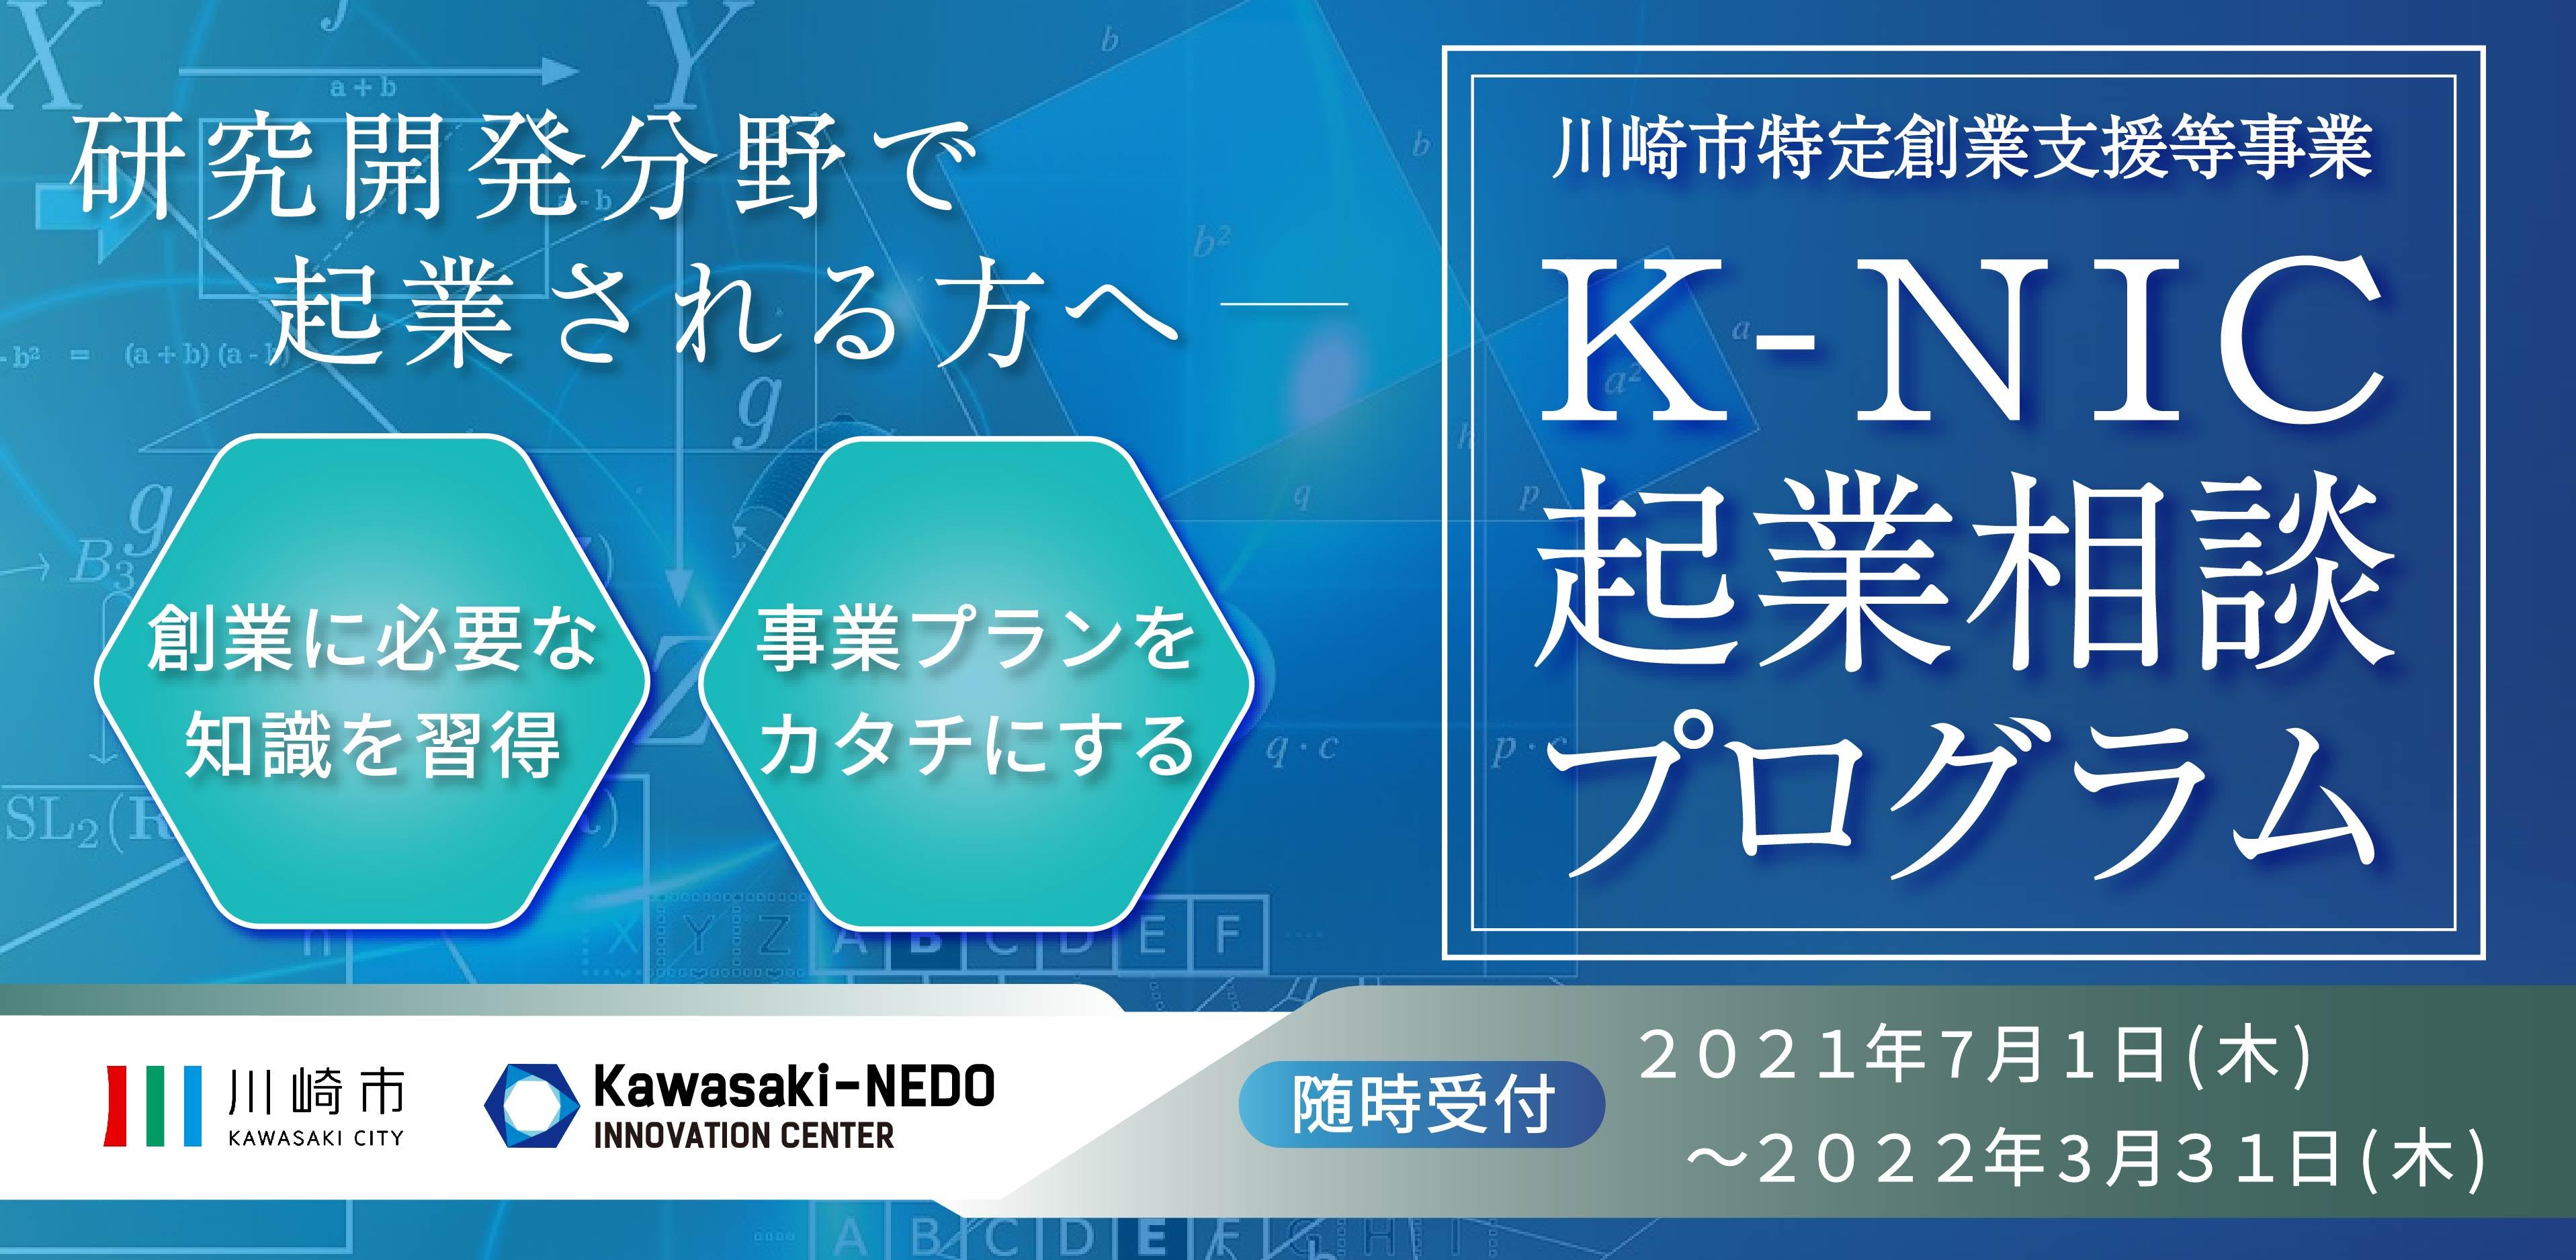 【募集開始】K-NIC起業相談プログラム(川崎市特定創業支援等事業)